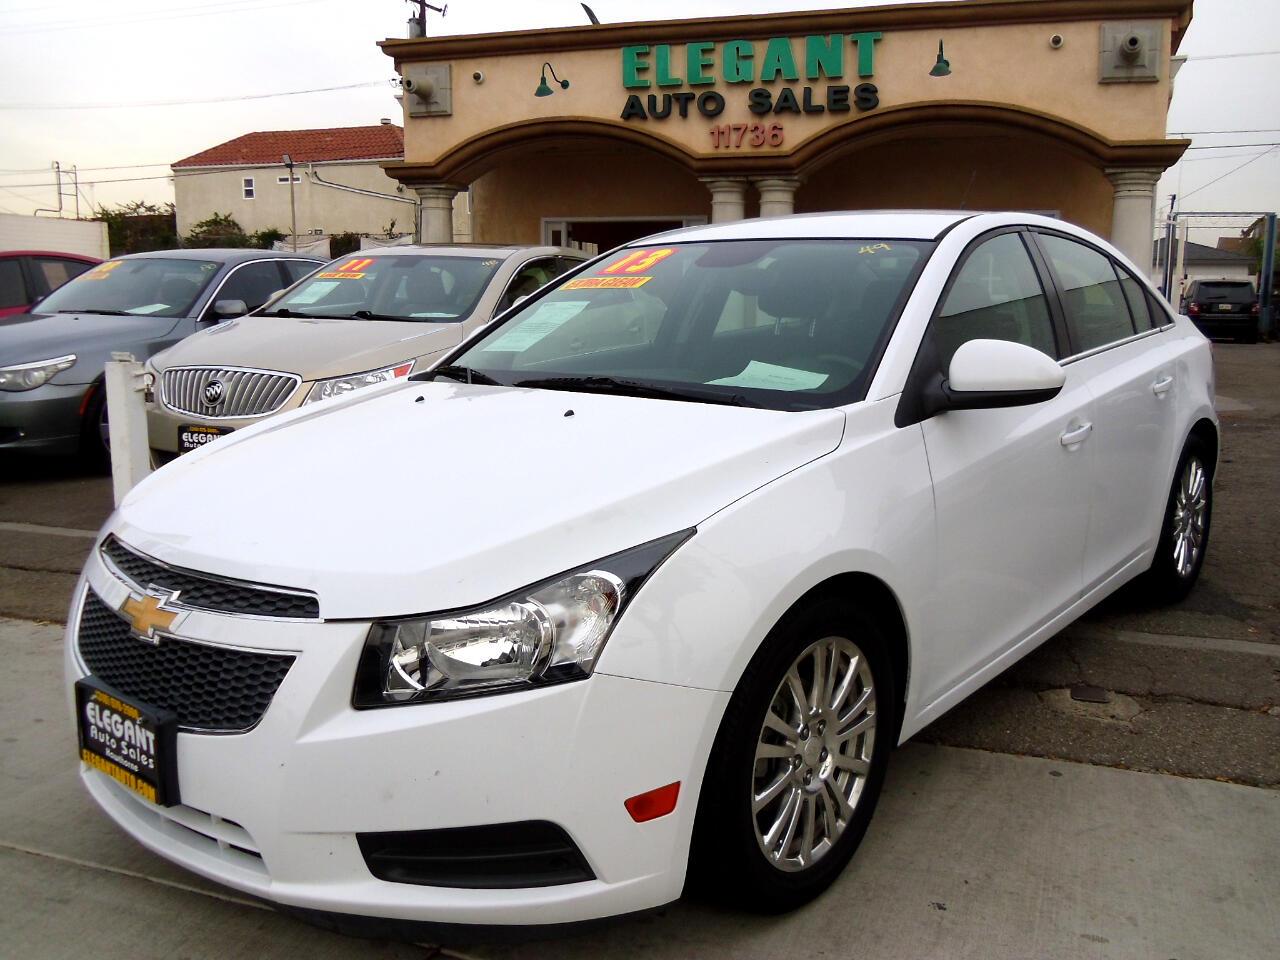 Chevrolet Cruze 4dr Sdn Auto ECO 2013